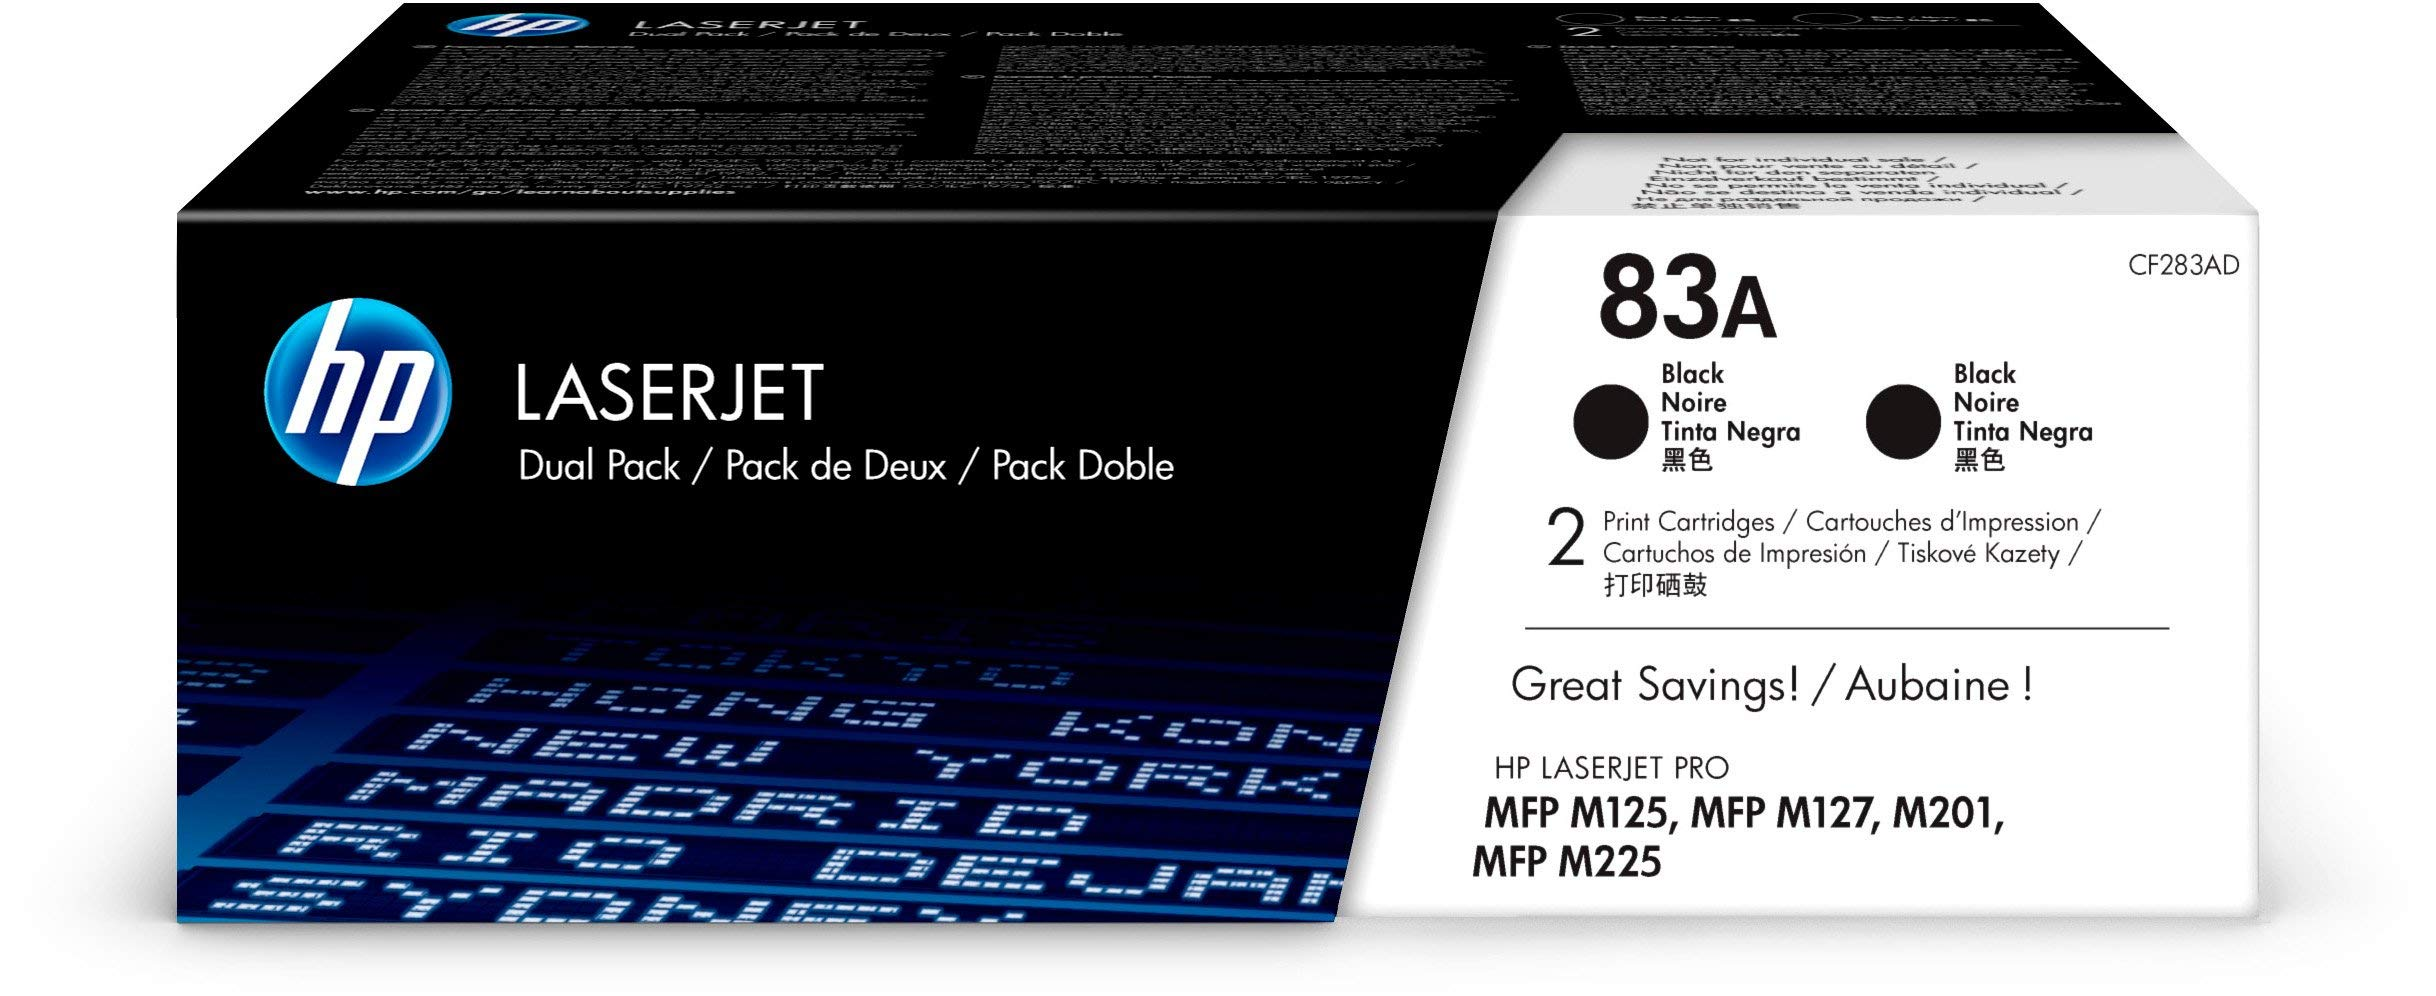 HP-83A-Schwarz-Original-Toner-fr-HP-Laserjet-Pro-M201-M225-M127-M125